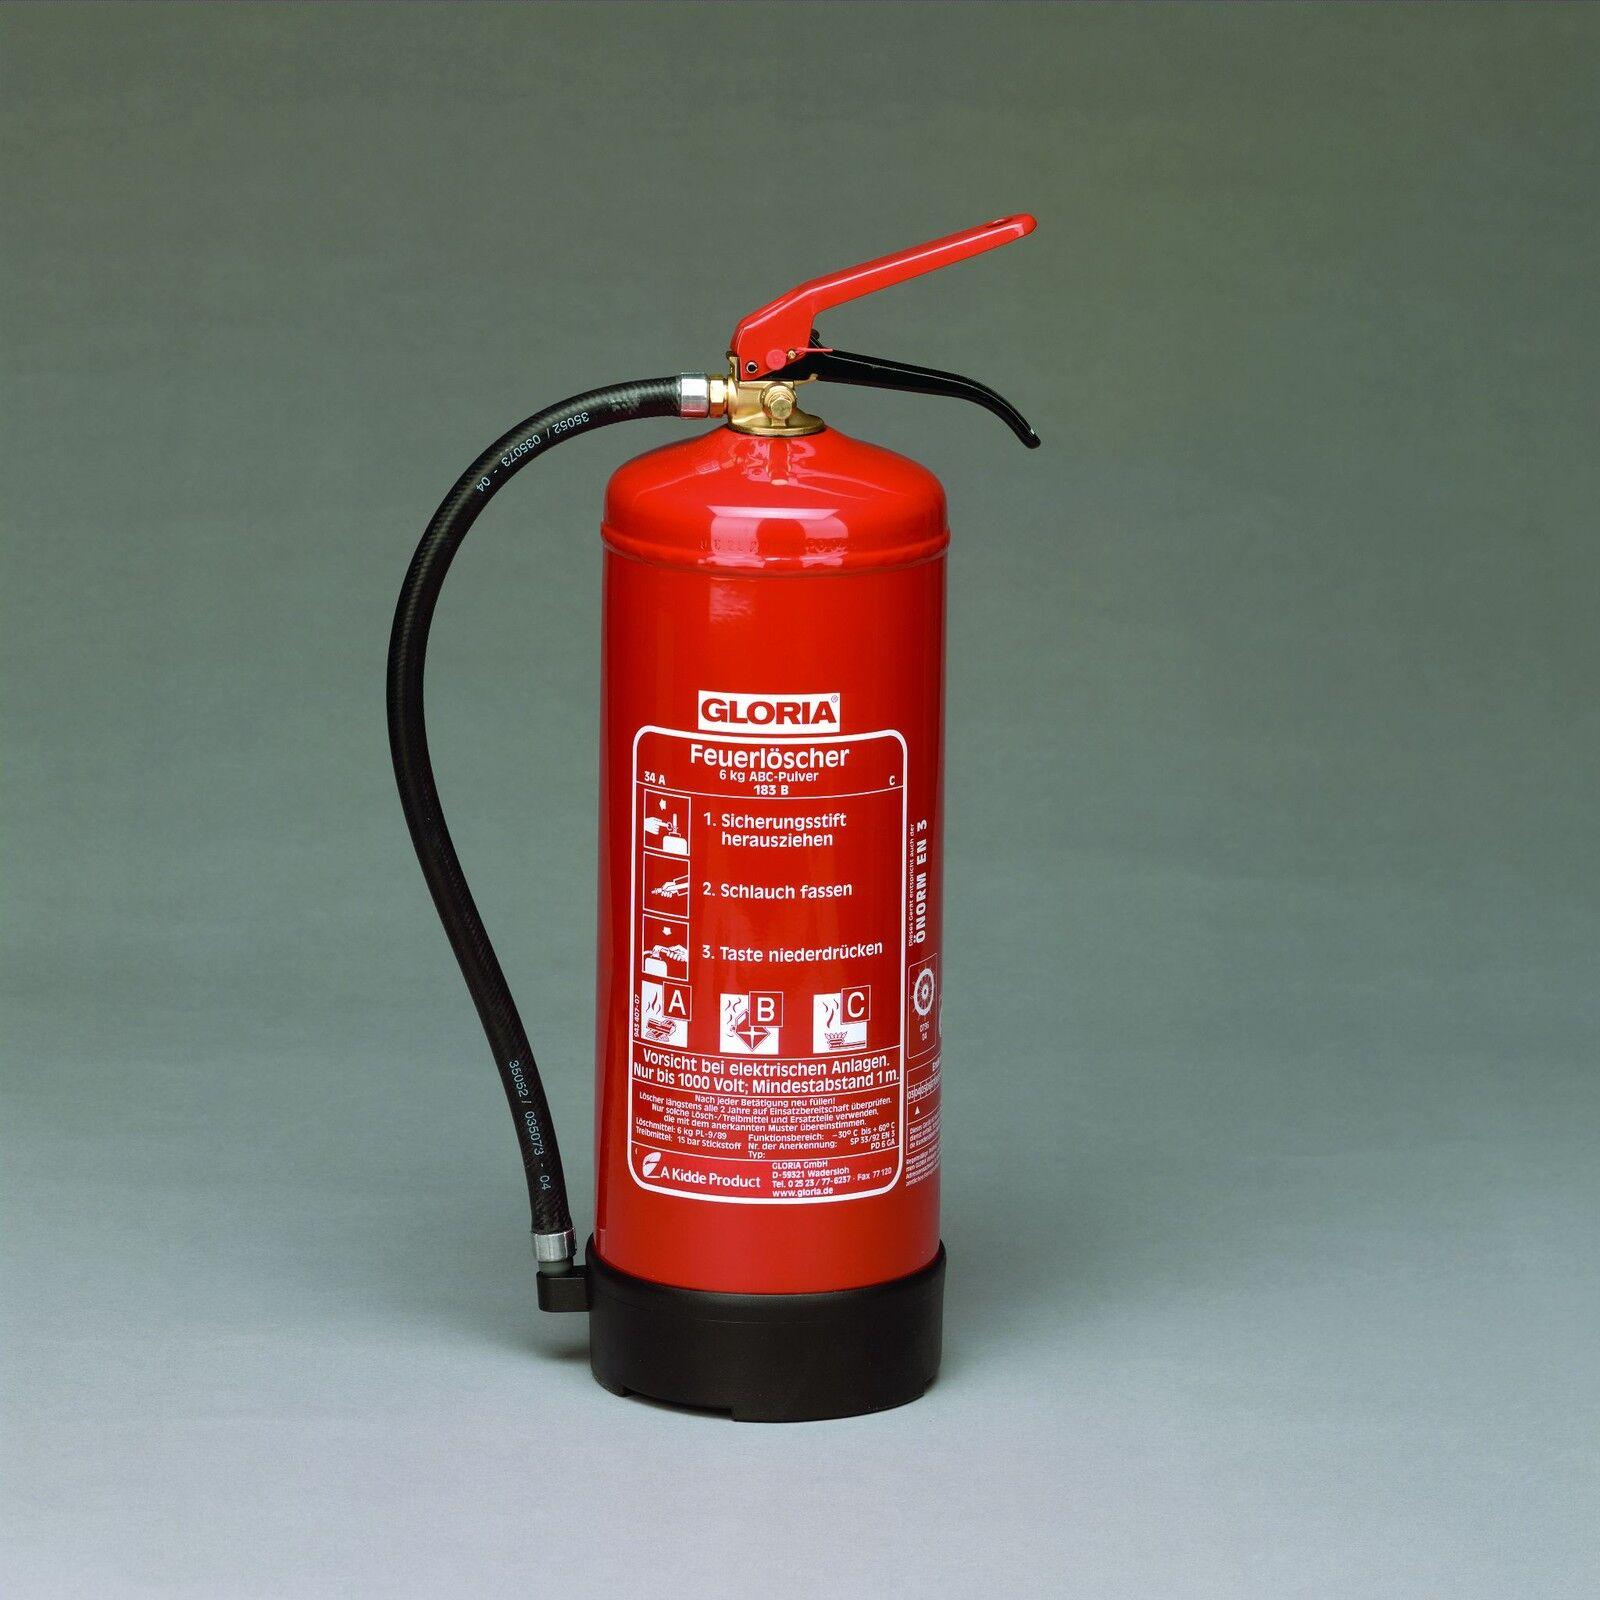 Feuerlöscher Gloria PD 6 GA